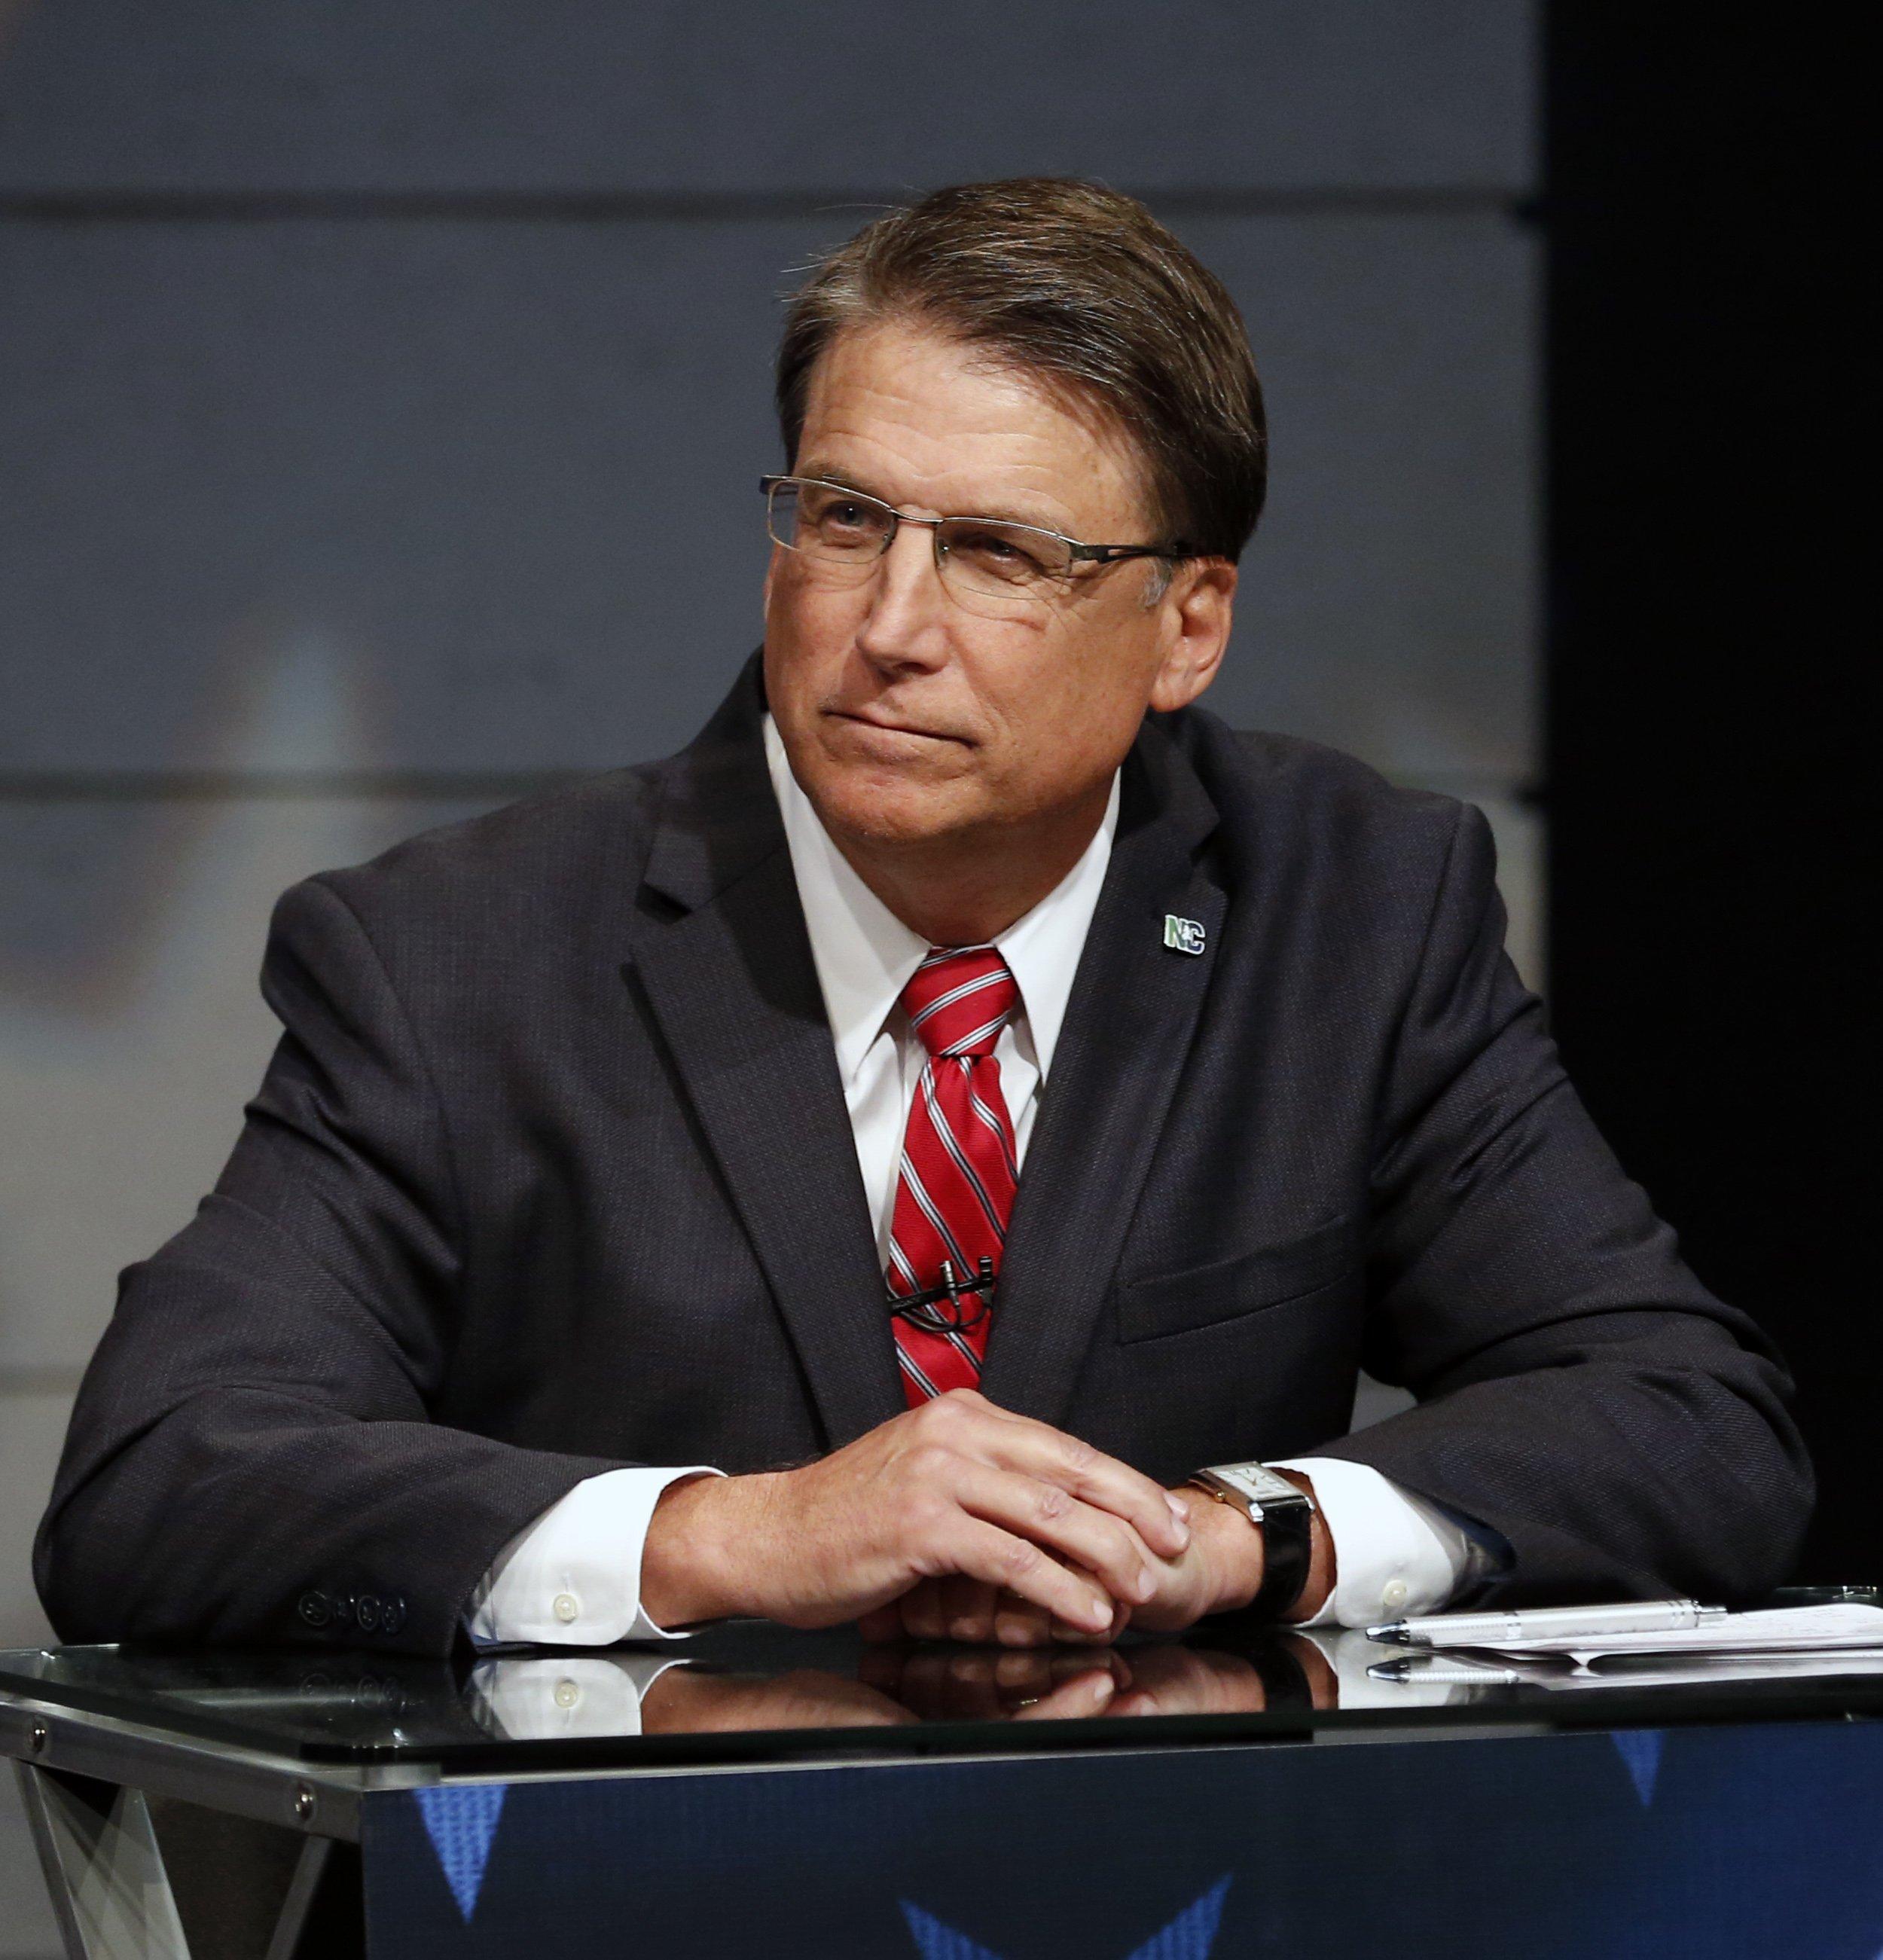 North Carolina gubernatorial debate